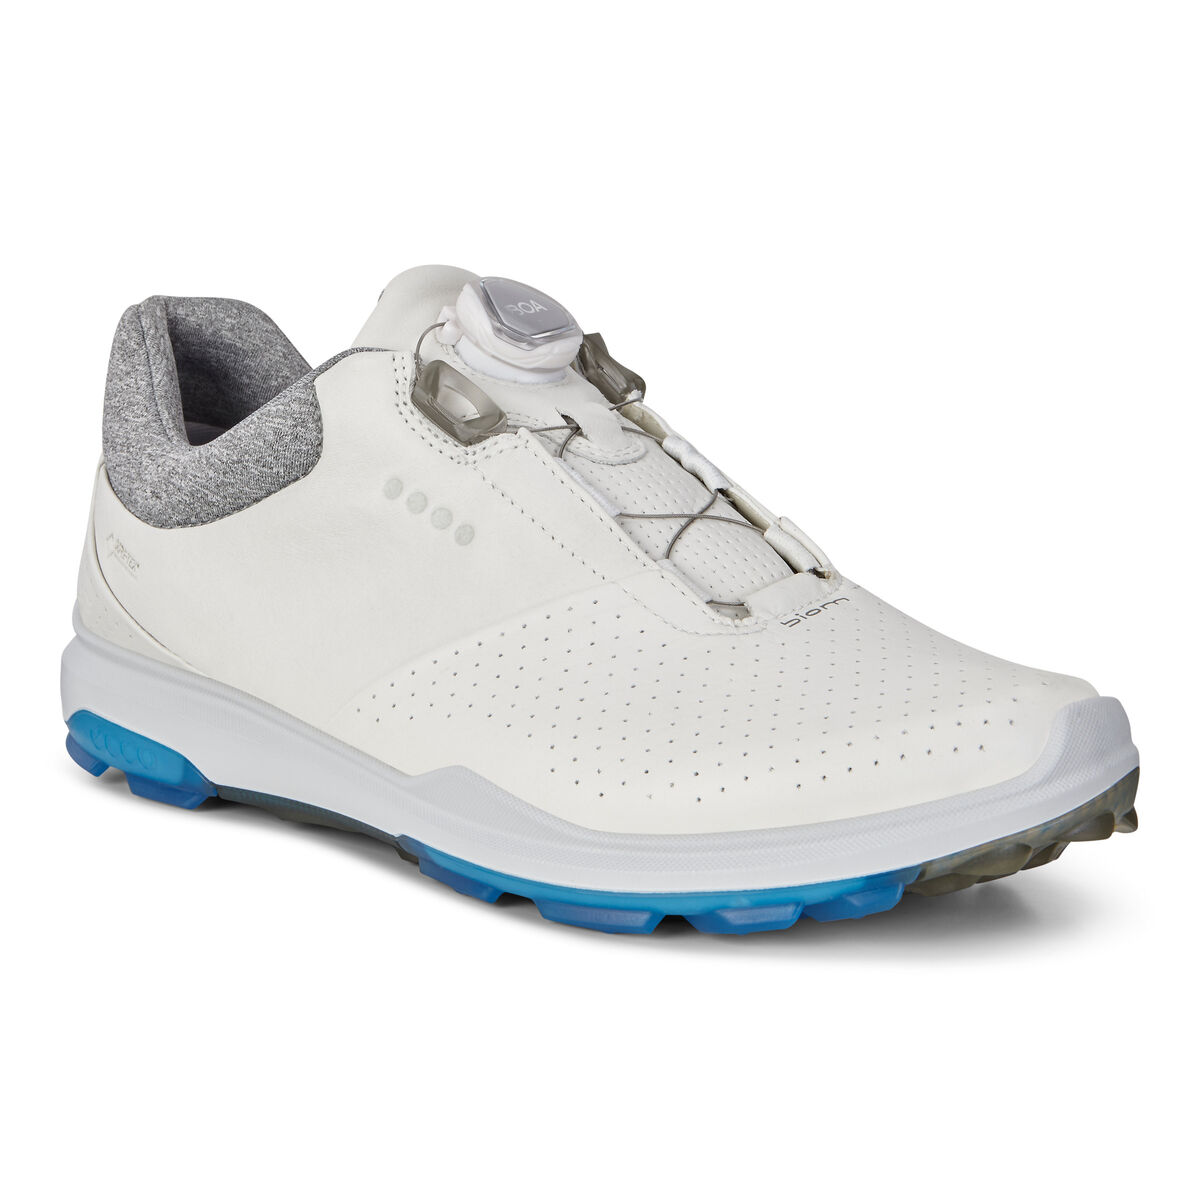 13f760b6c9e8 ECCO BIOM Hybrid 3 BOA Men s Golf Shoe - White Blue